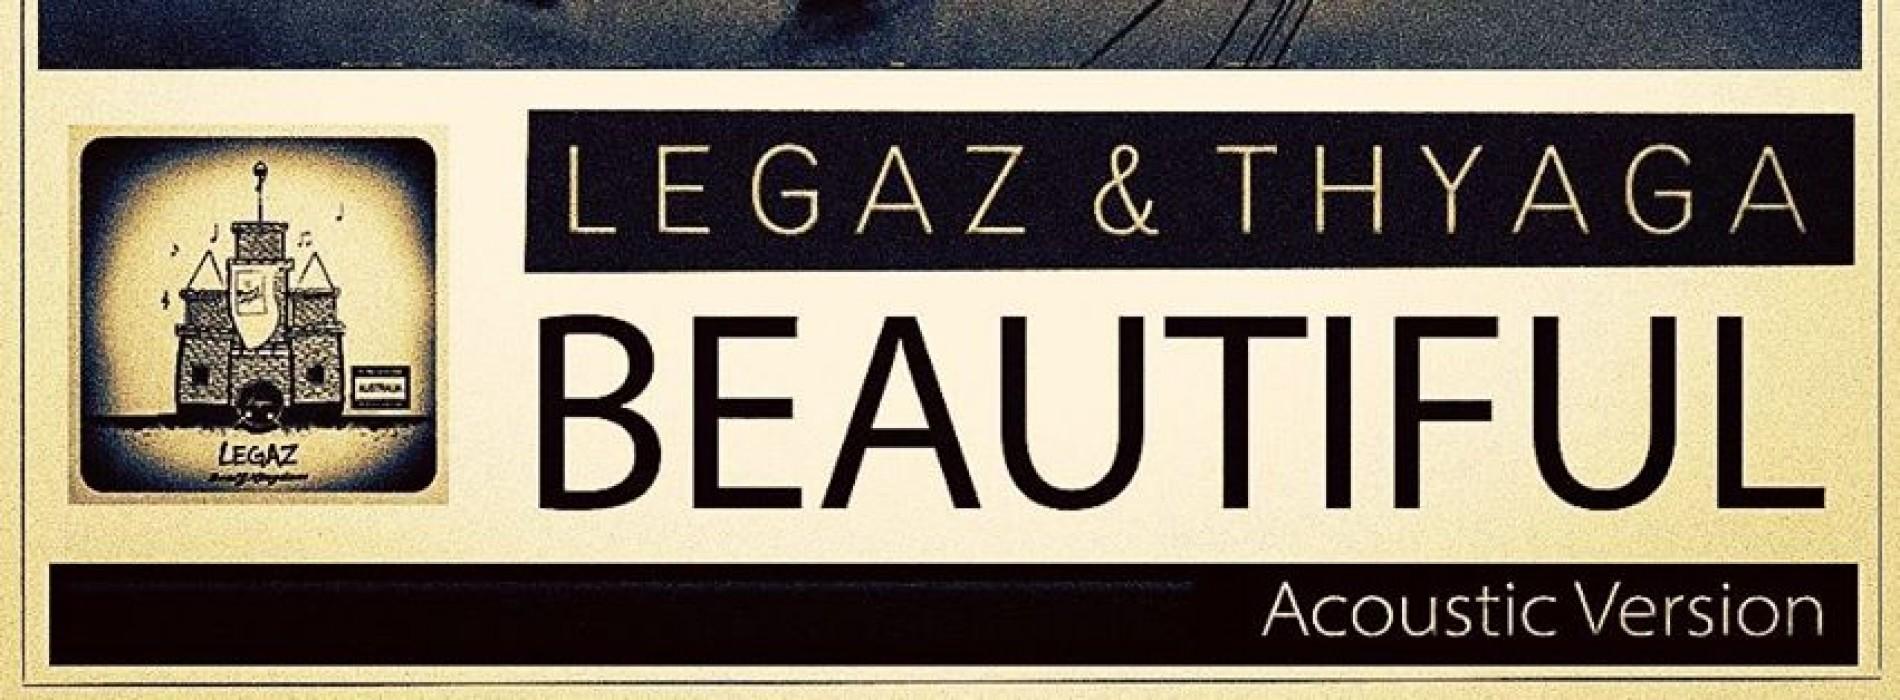 Legaz Ft Tyaga Dimitri: Beautiful (Acoustic Version)